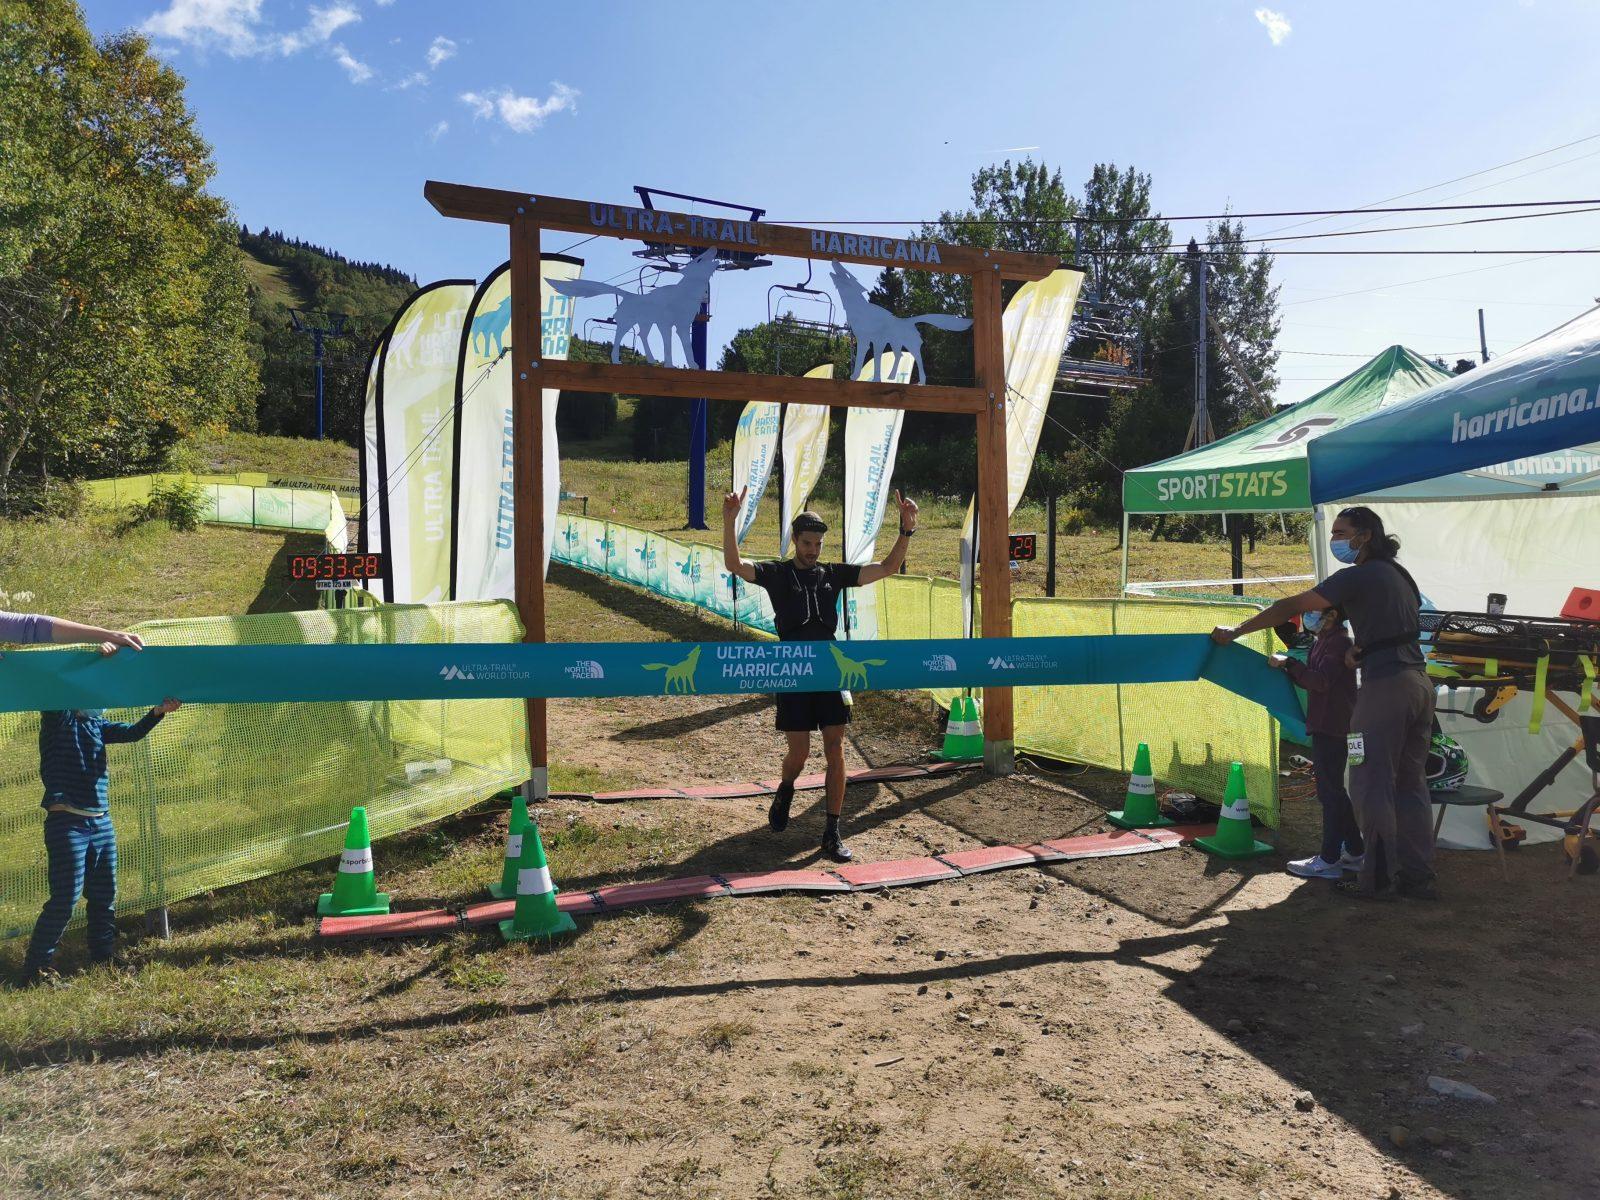 Ultra-Trail Harricana Canada : Martin Dagenais est le gagnant du 65 kilomètres